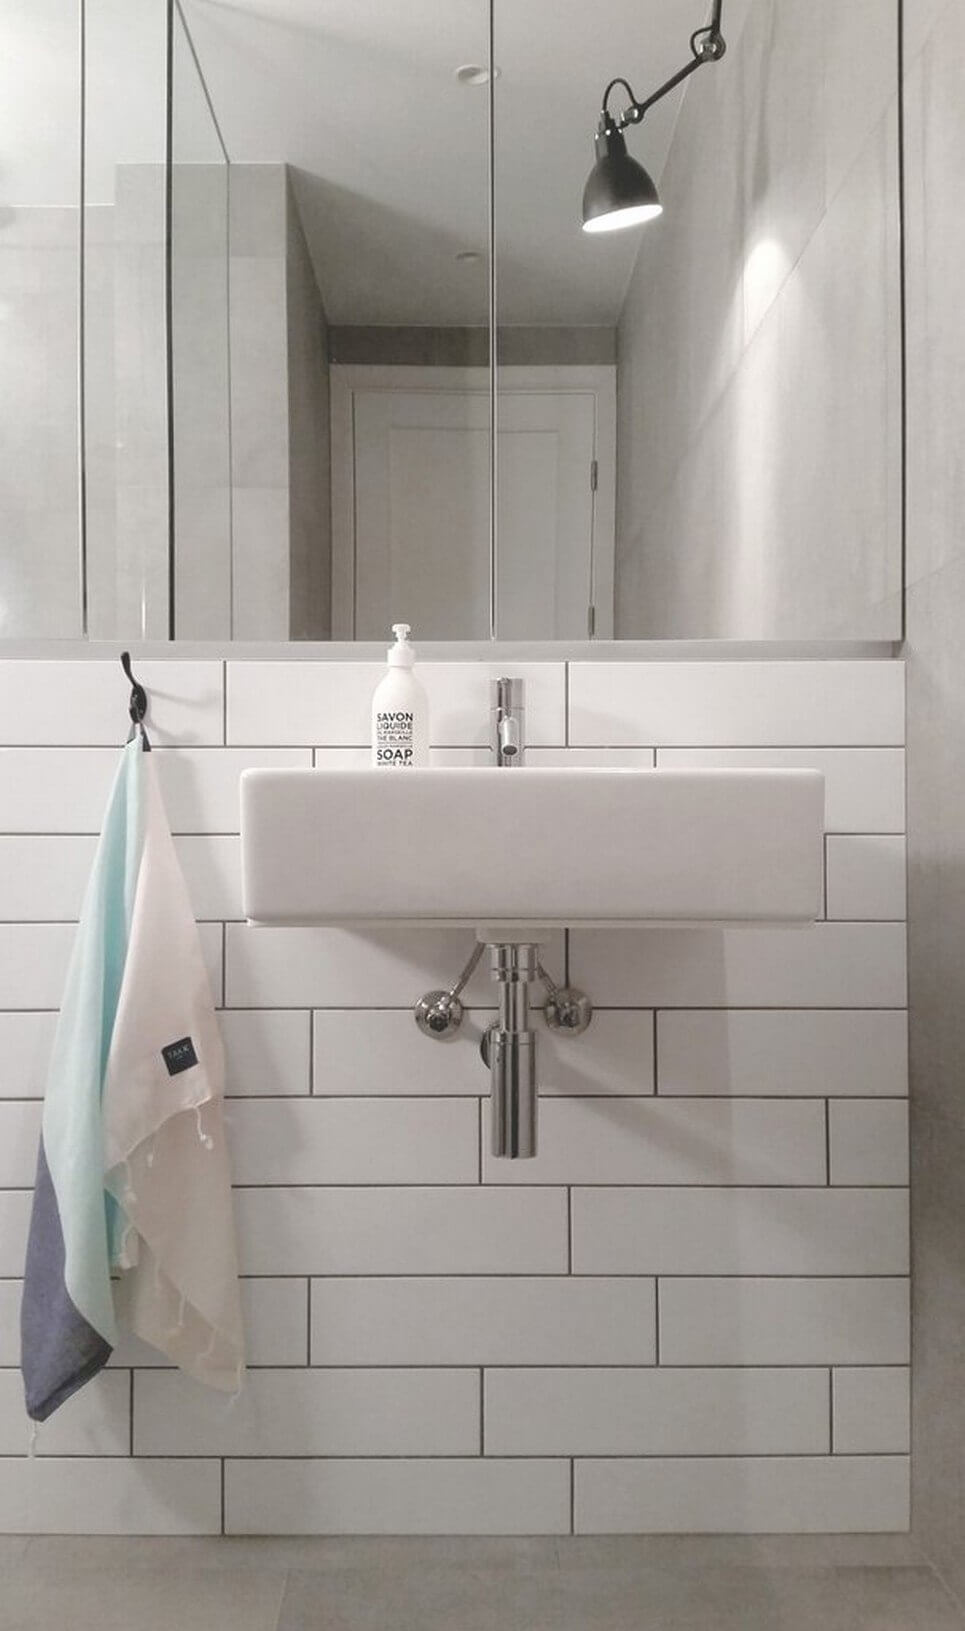 Sjor Kitchen Hand Towel